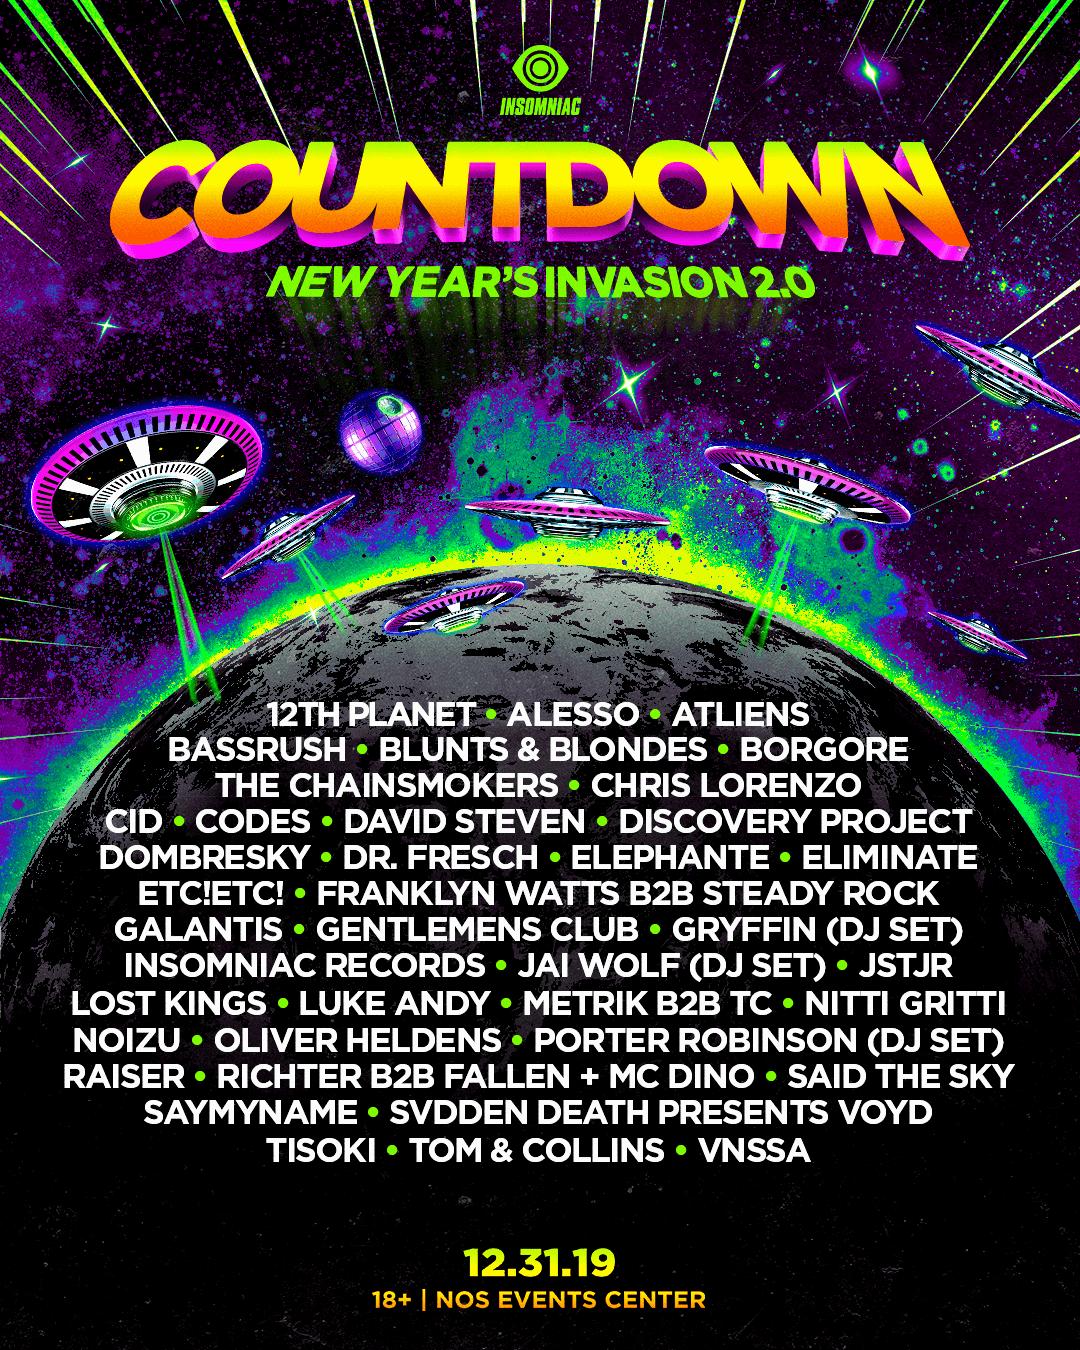 Countdown lineup